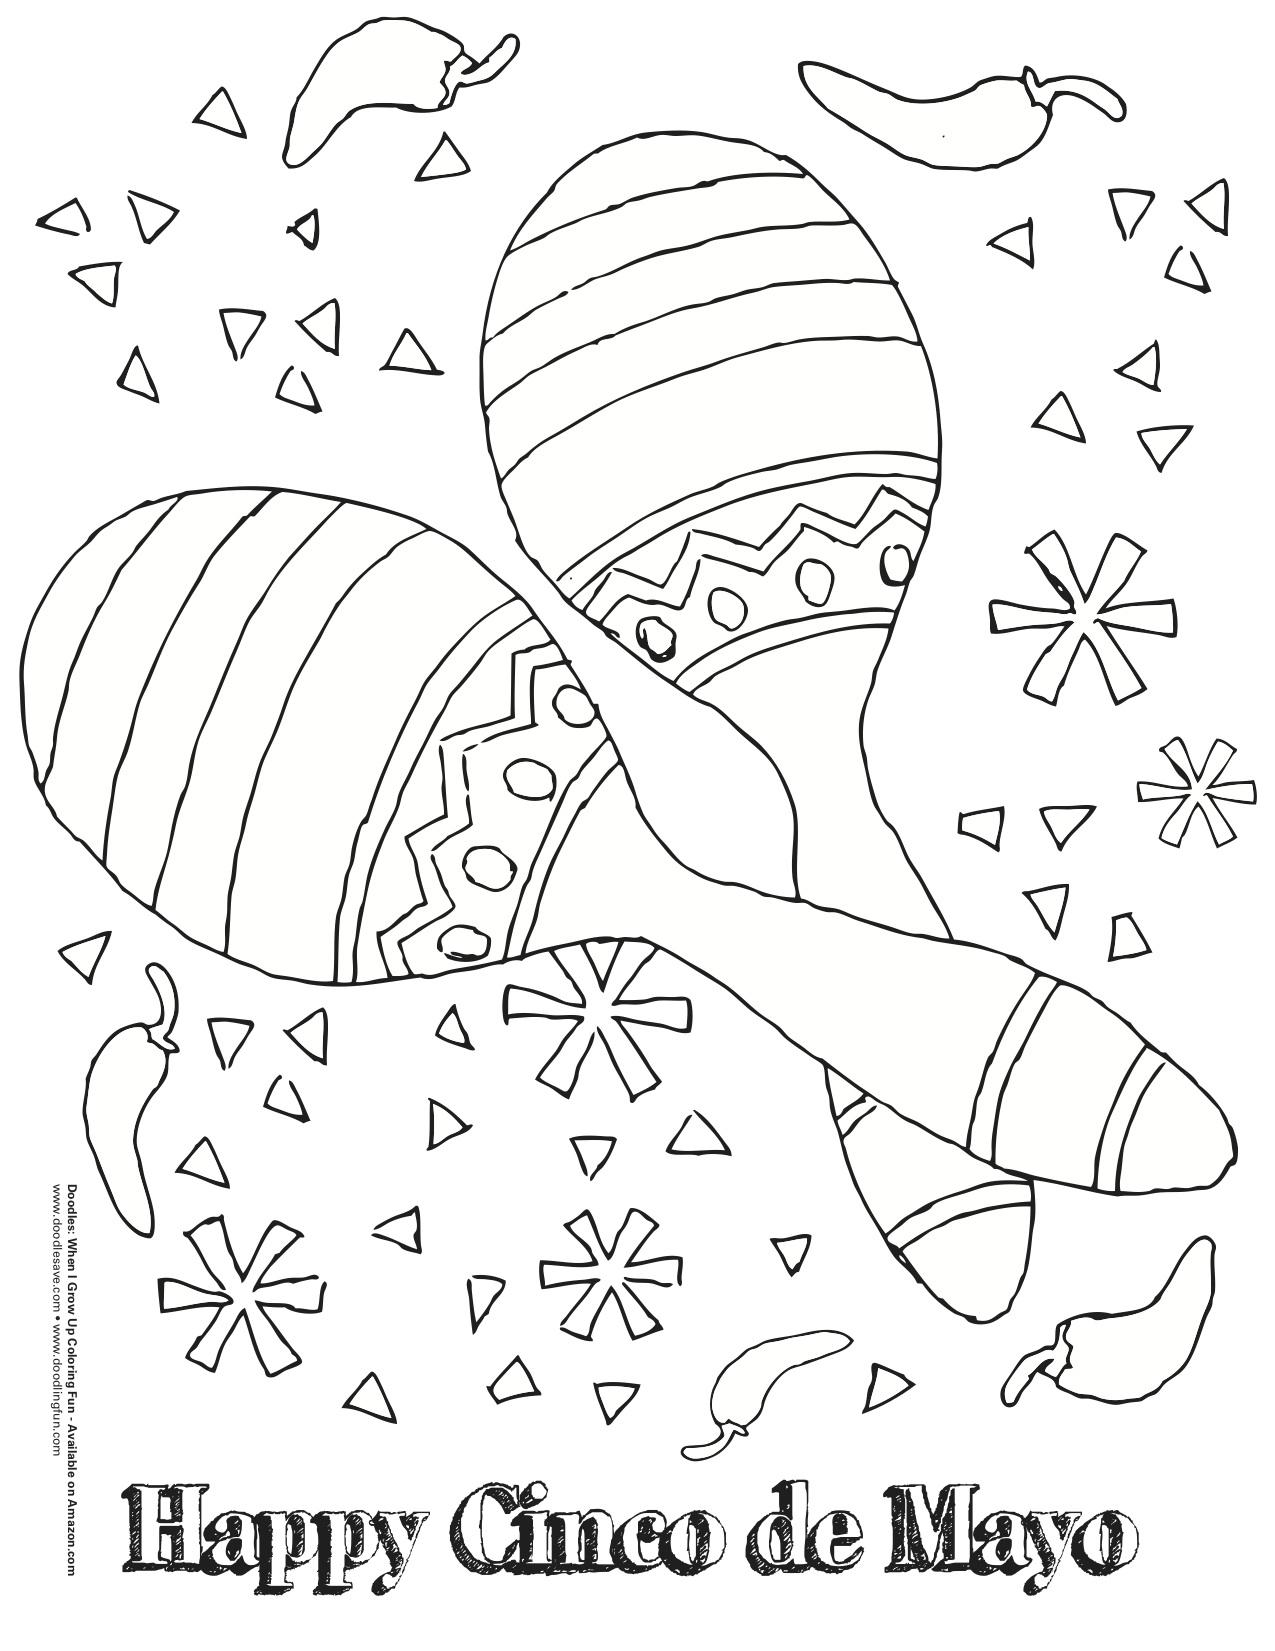 disney maracas coloring pages - photo#38